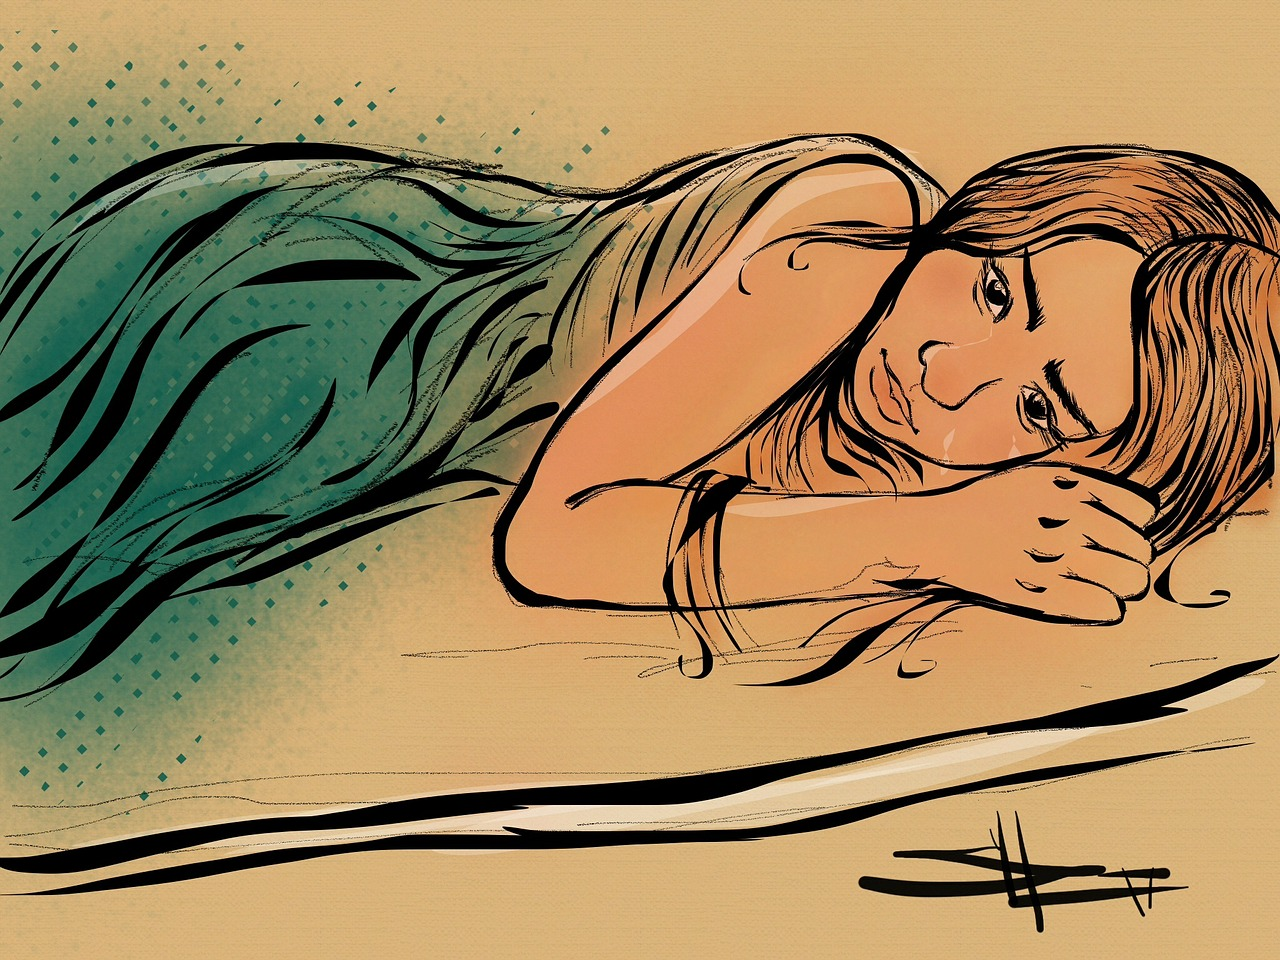 ▷ Como Parar De Chorar Rápido? (Técnica Infalível)